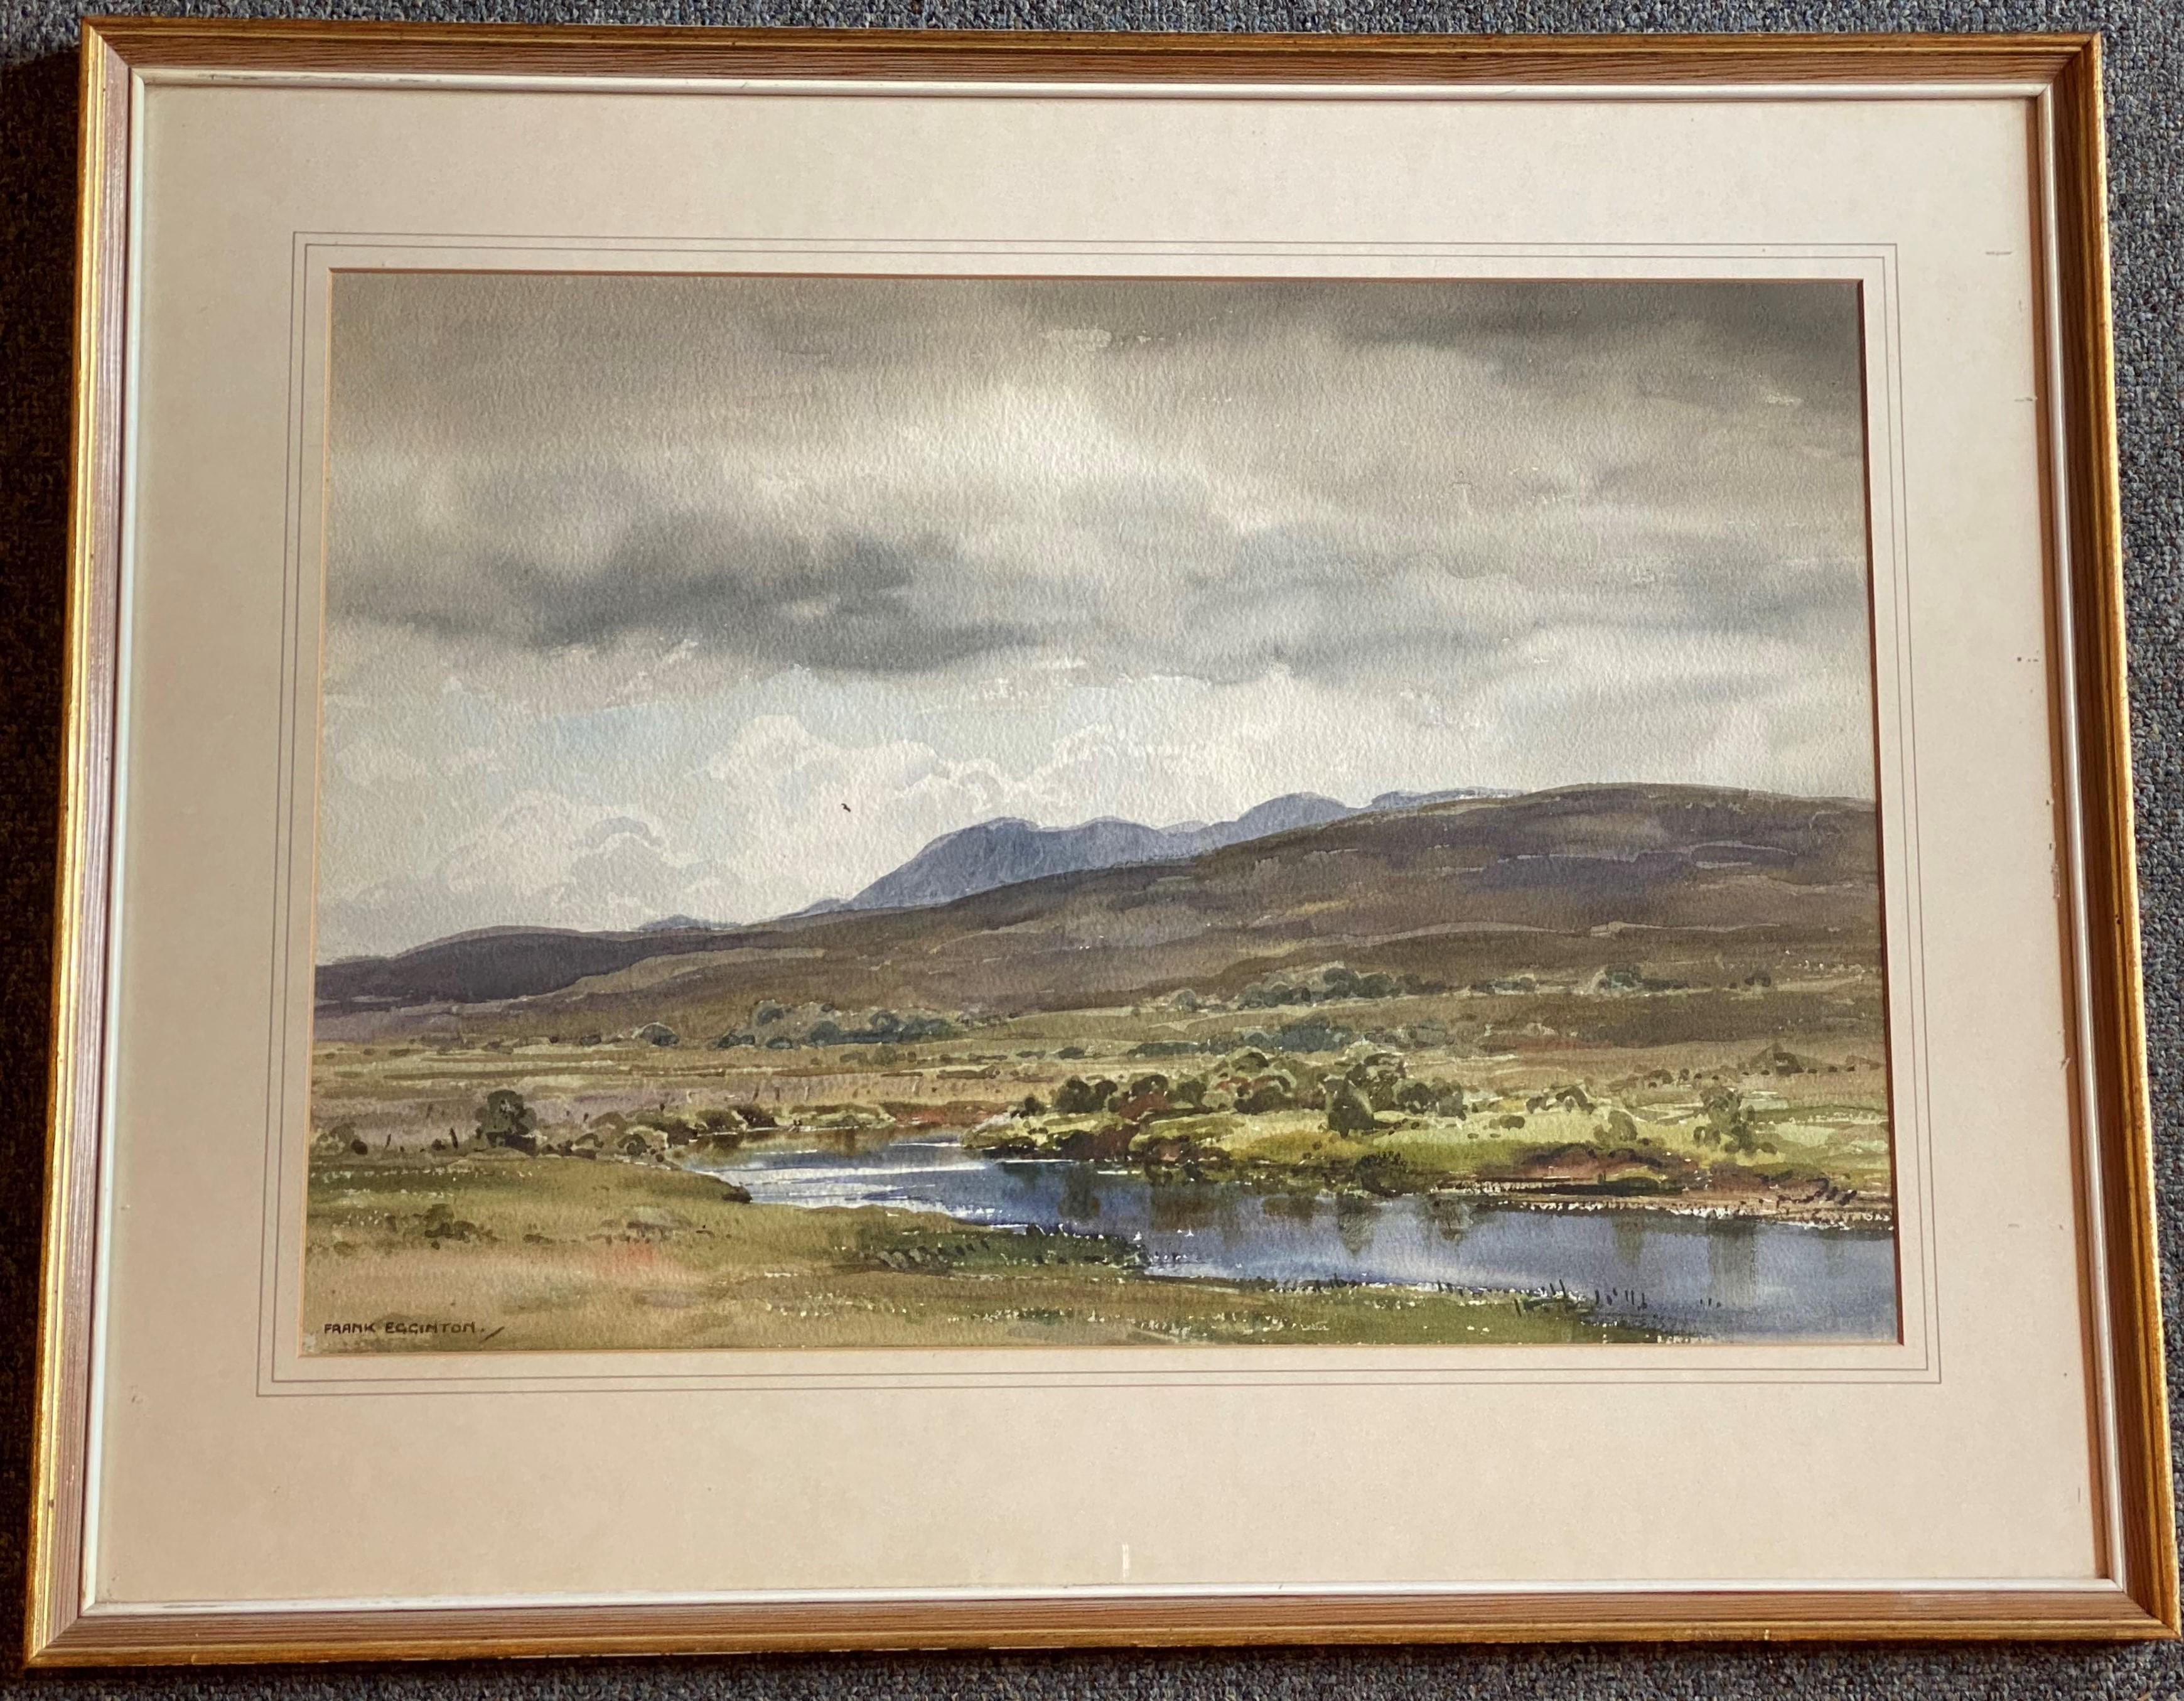 Frank Egginton RCA FIALL 1908 – 1990 signed watercolour Irish Landscape - Image 2 of 3